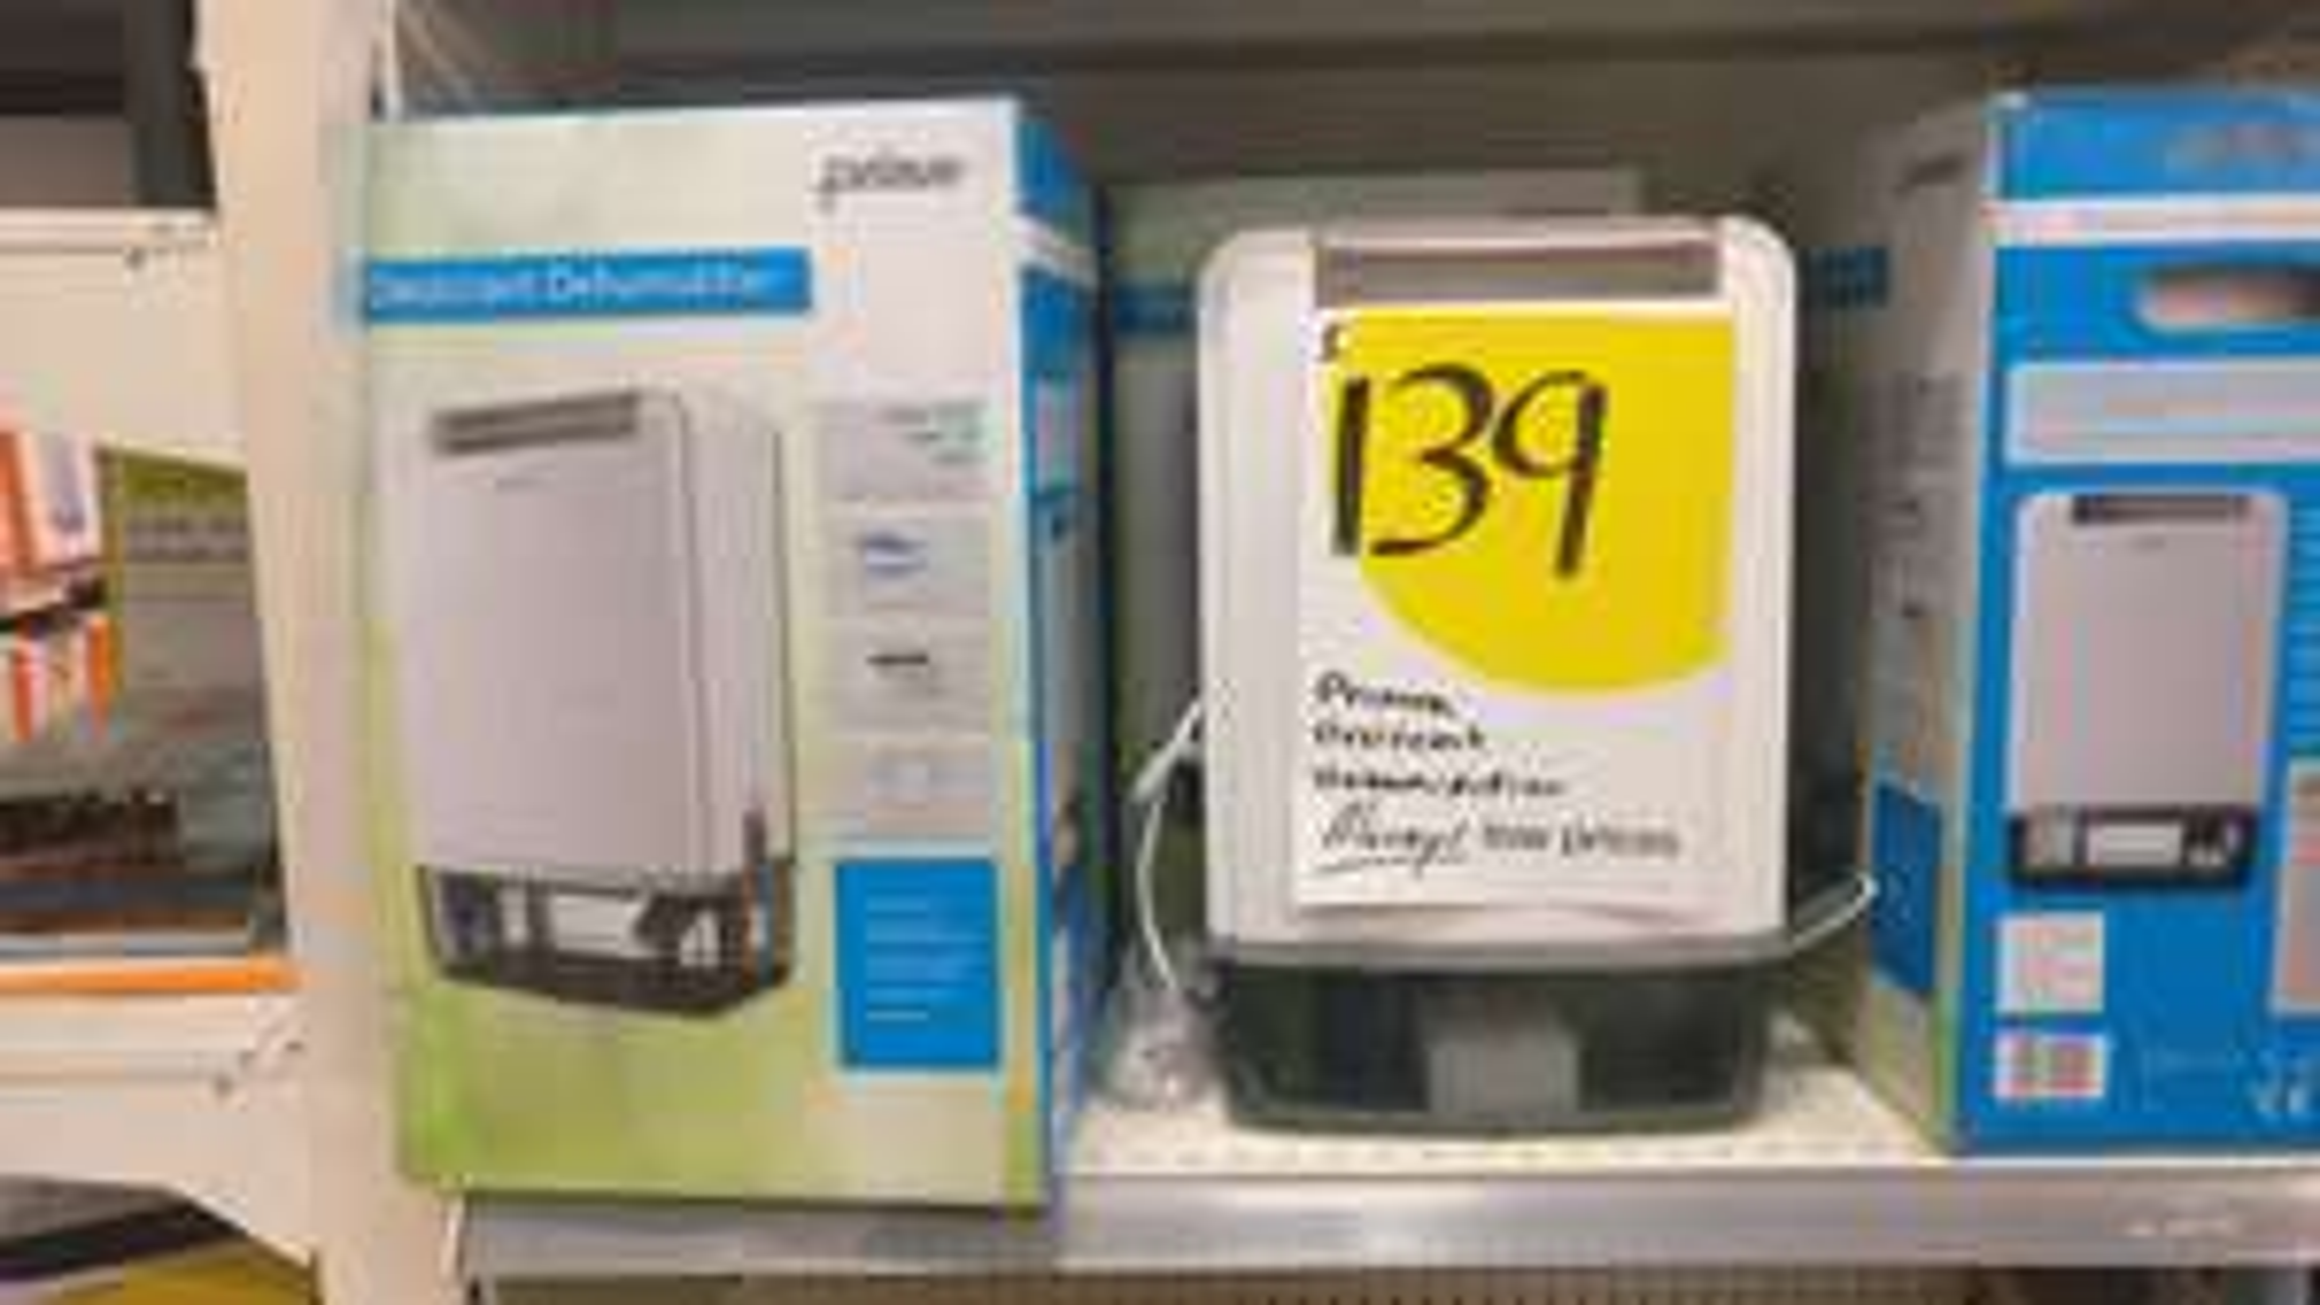 Prima Desiccant Dehumidifier £30 @ Homebase